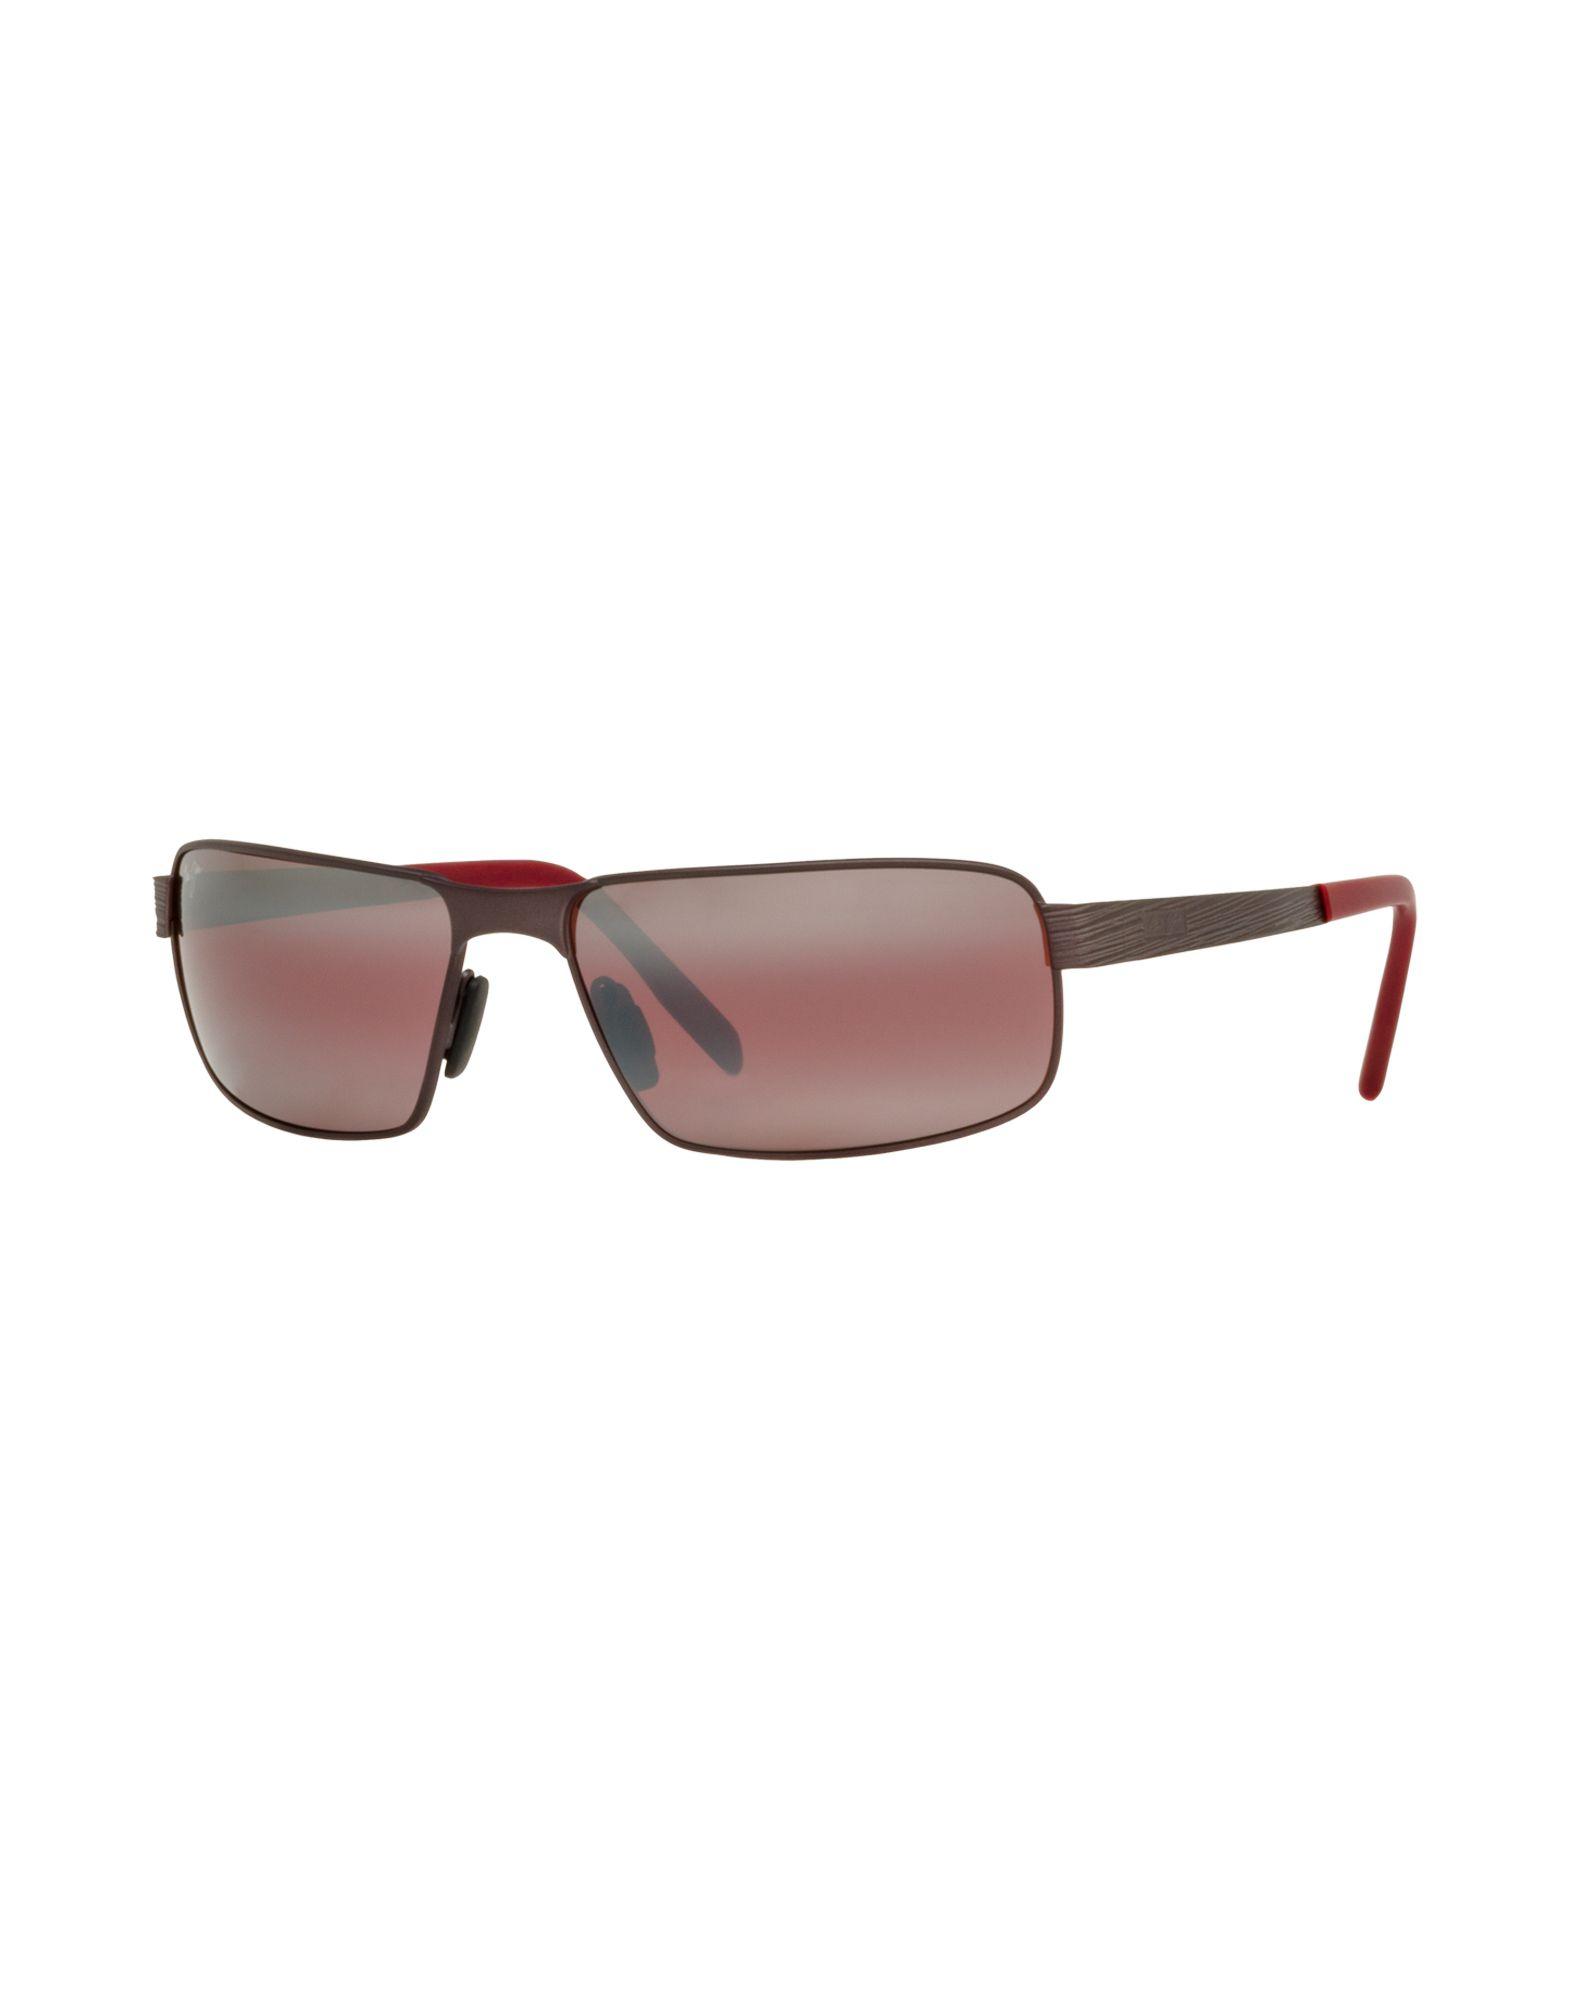 Maui jim Sunglasses in Gray (Grey)